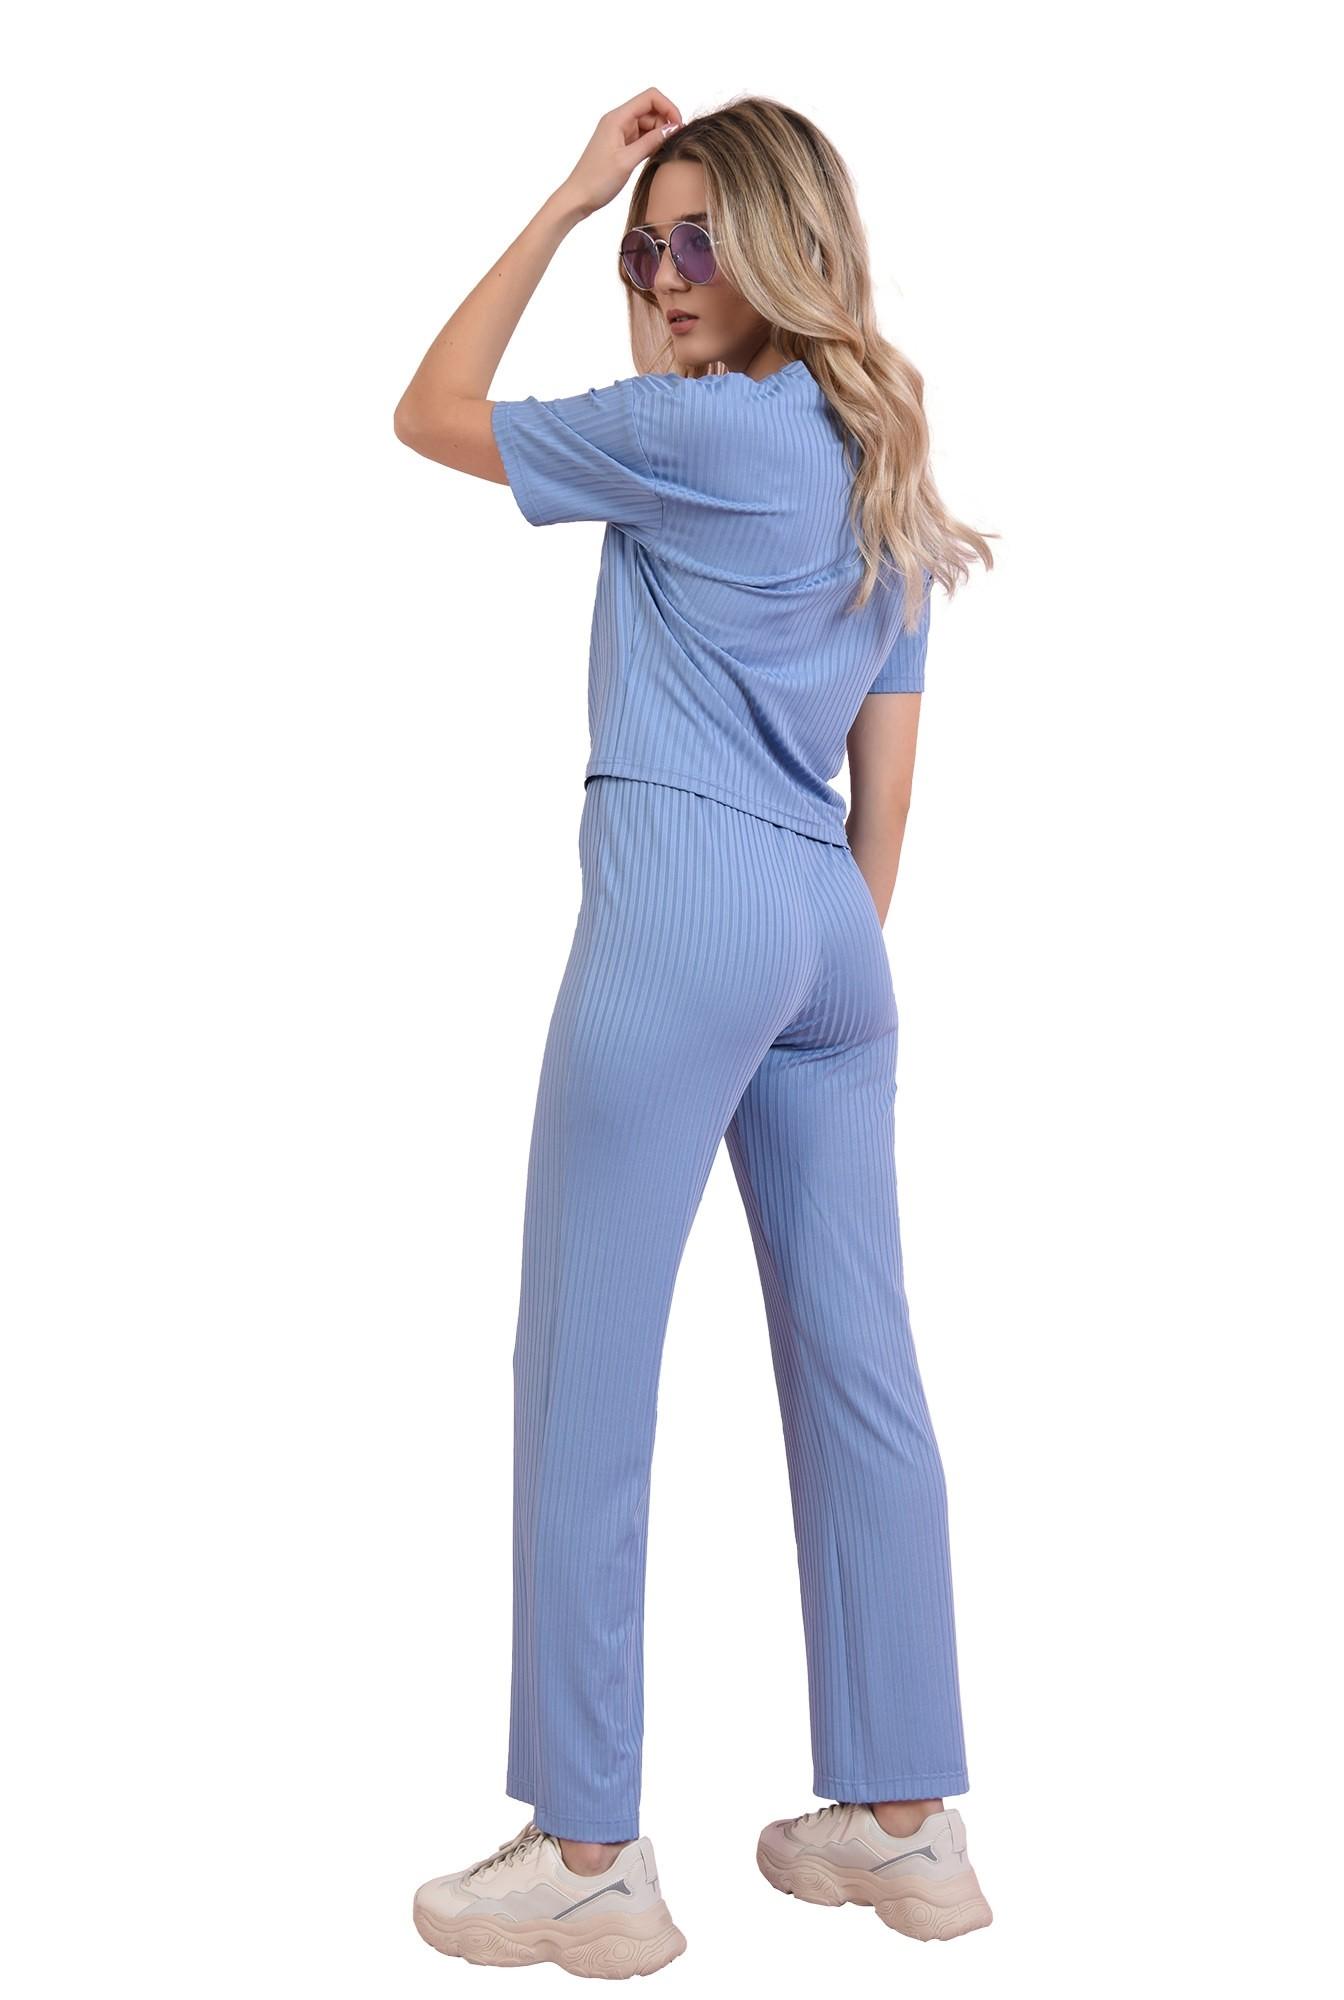 3 - compleu bleu, casual, cu pantaloni cullotes